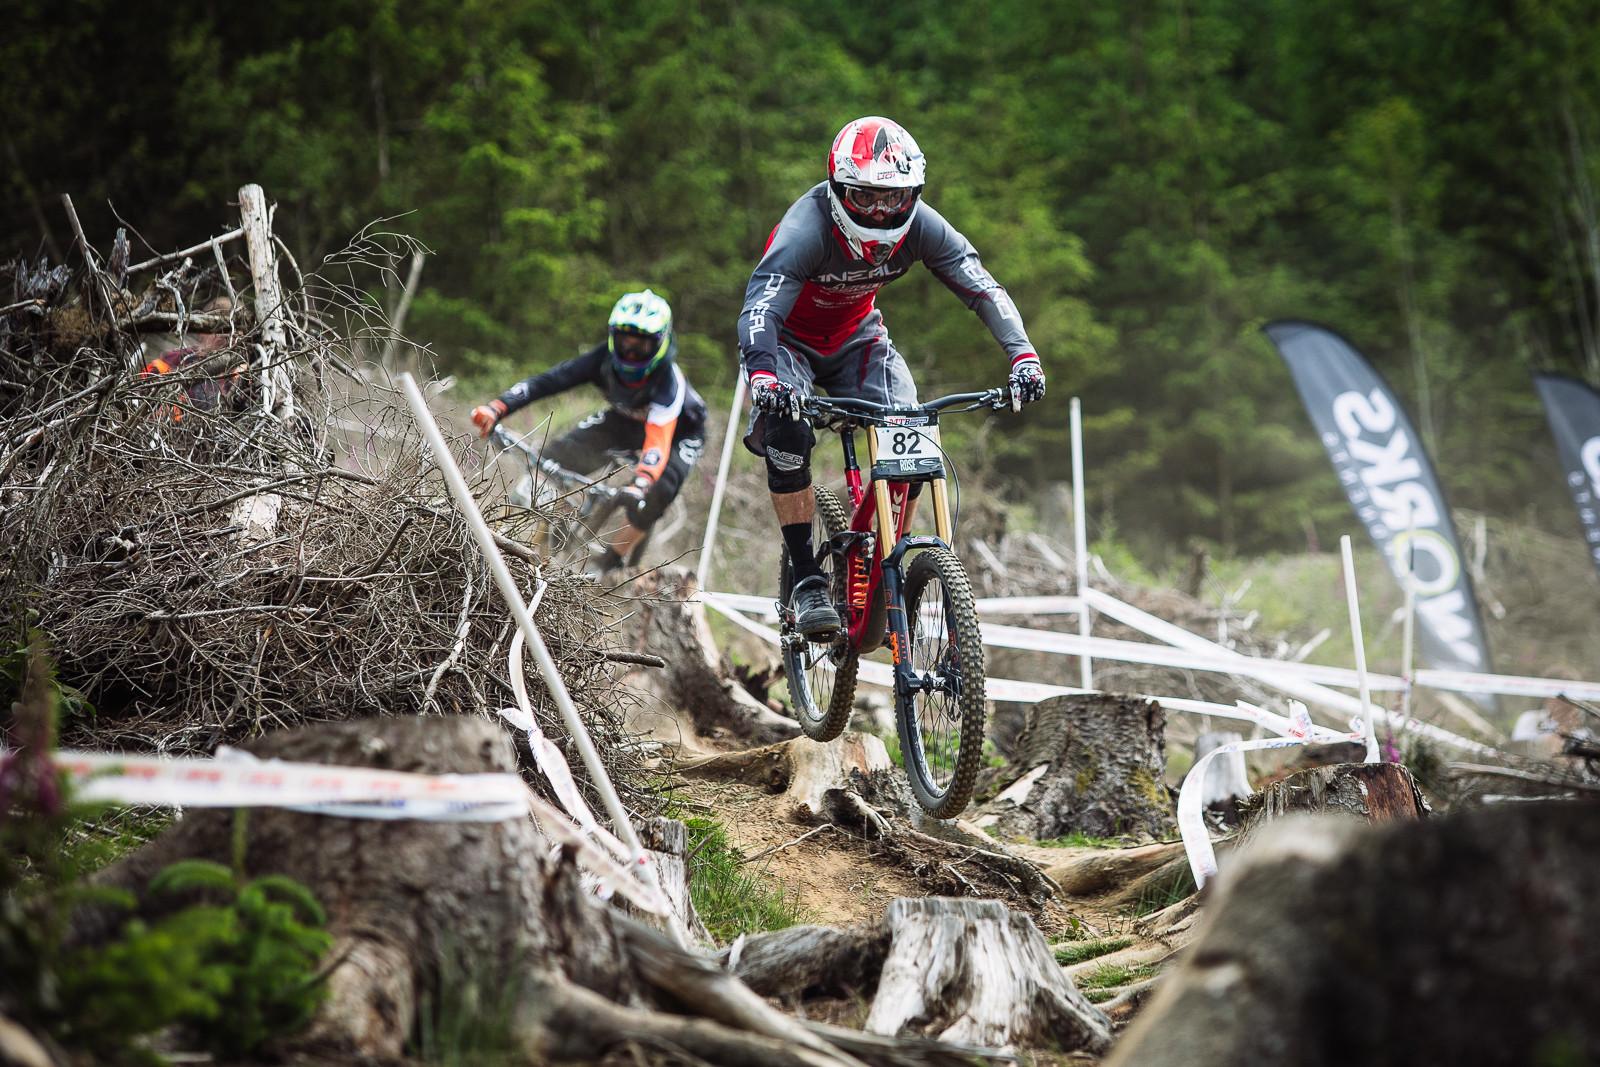 Jack Reading, British DH Series, Bala - RACE REPORT - 2015 British Downhill Series Bala - Mountain Biking Pictures - Vital MTB